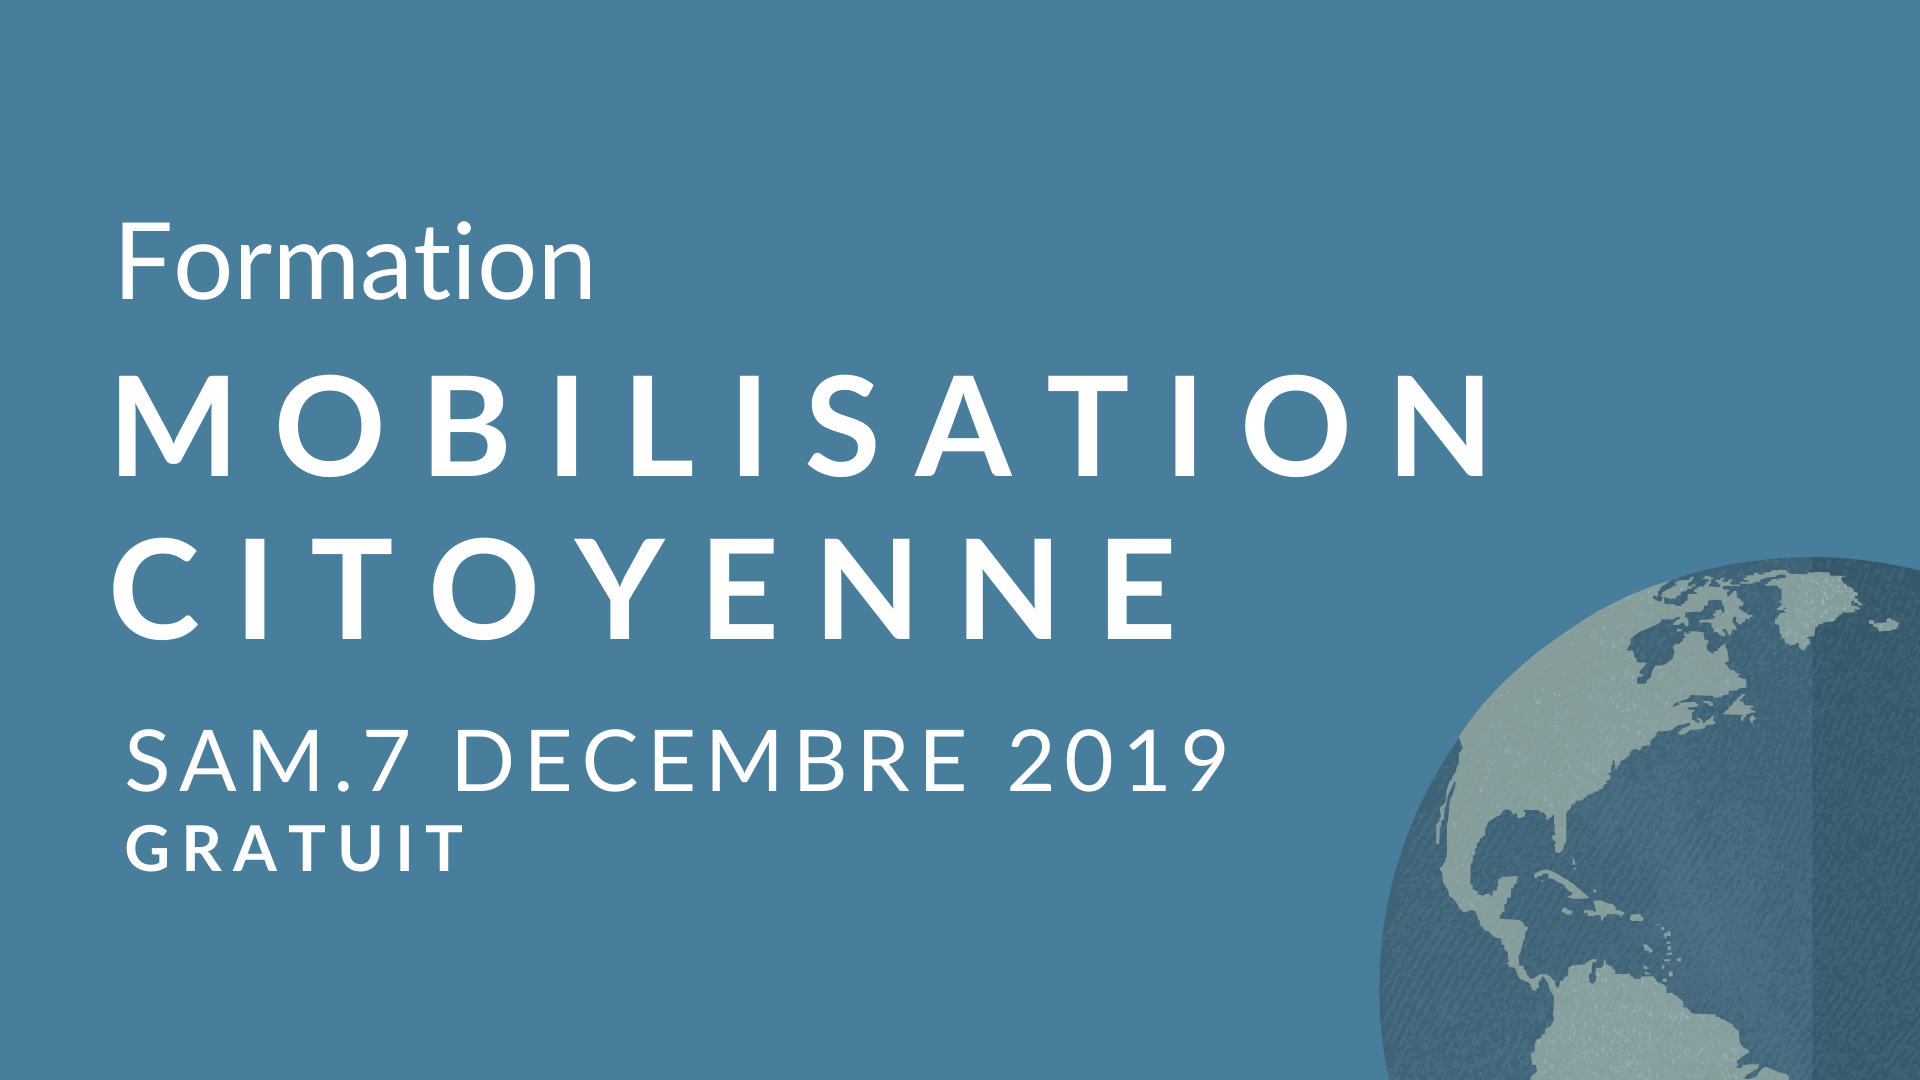 mobilisation_citoyenne-3.png